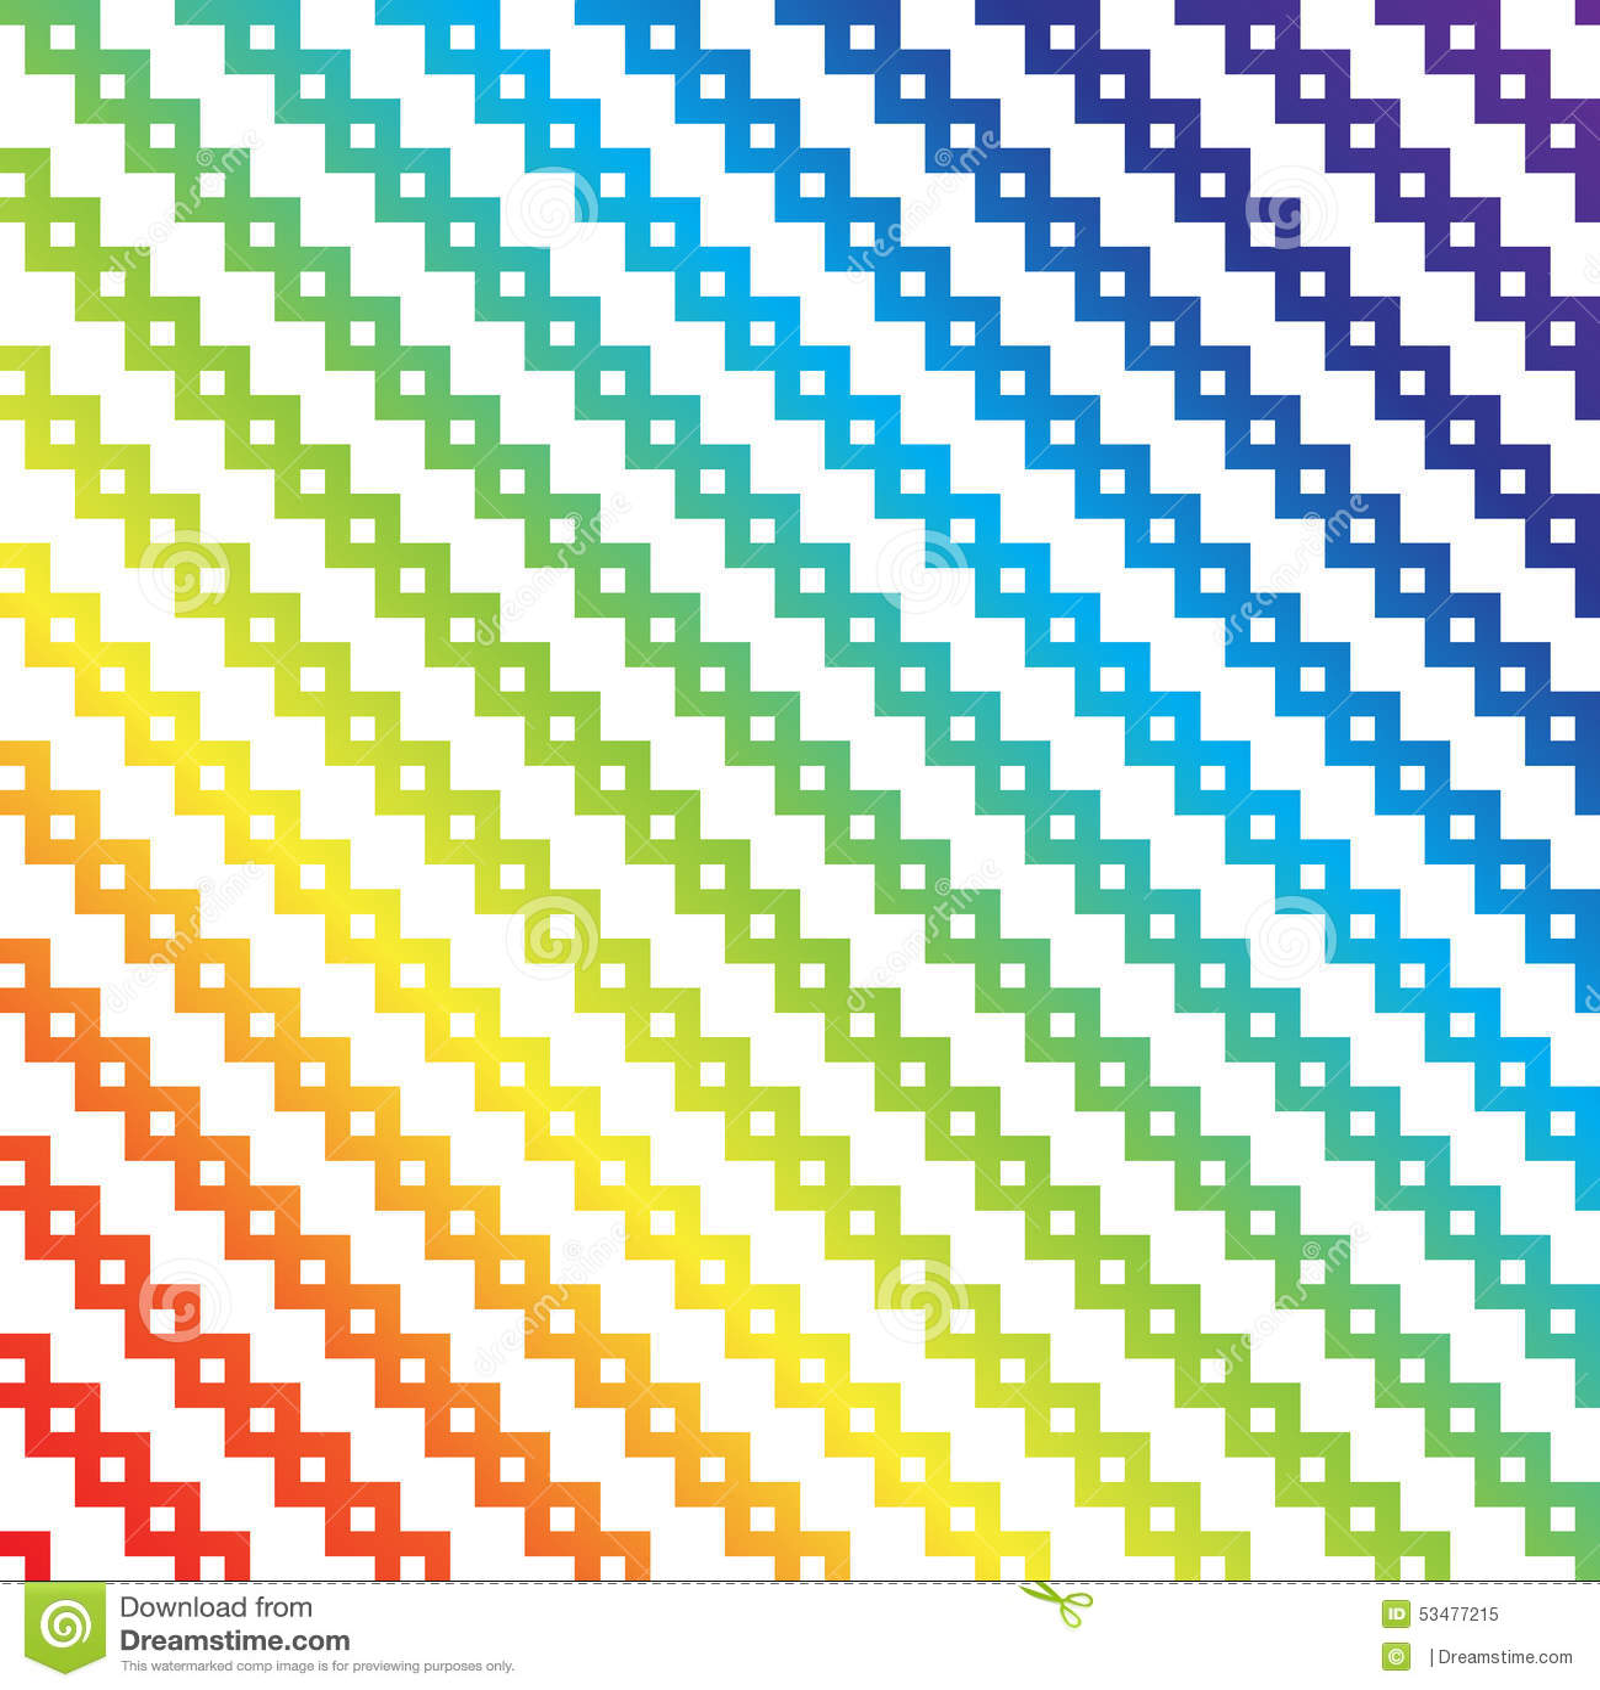 Art De Pixel D Arc En Ciel Illustration De Vecteur Illustration Du Ciel 53477215